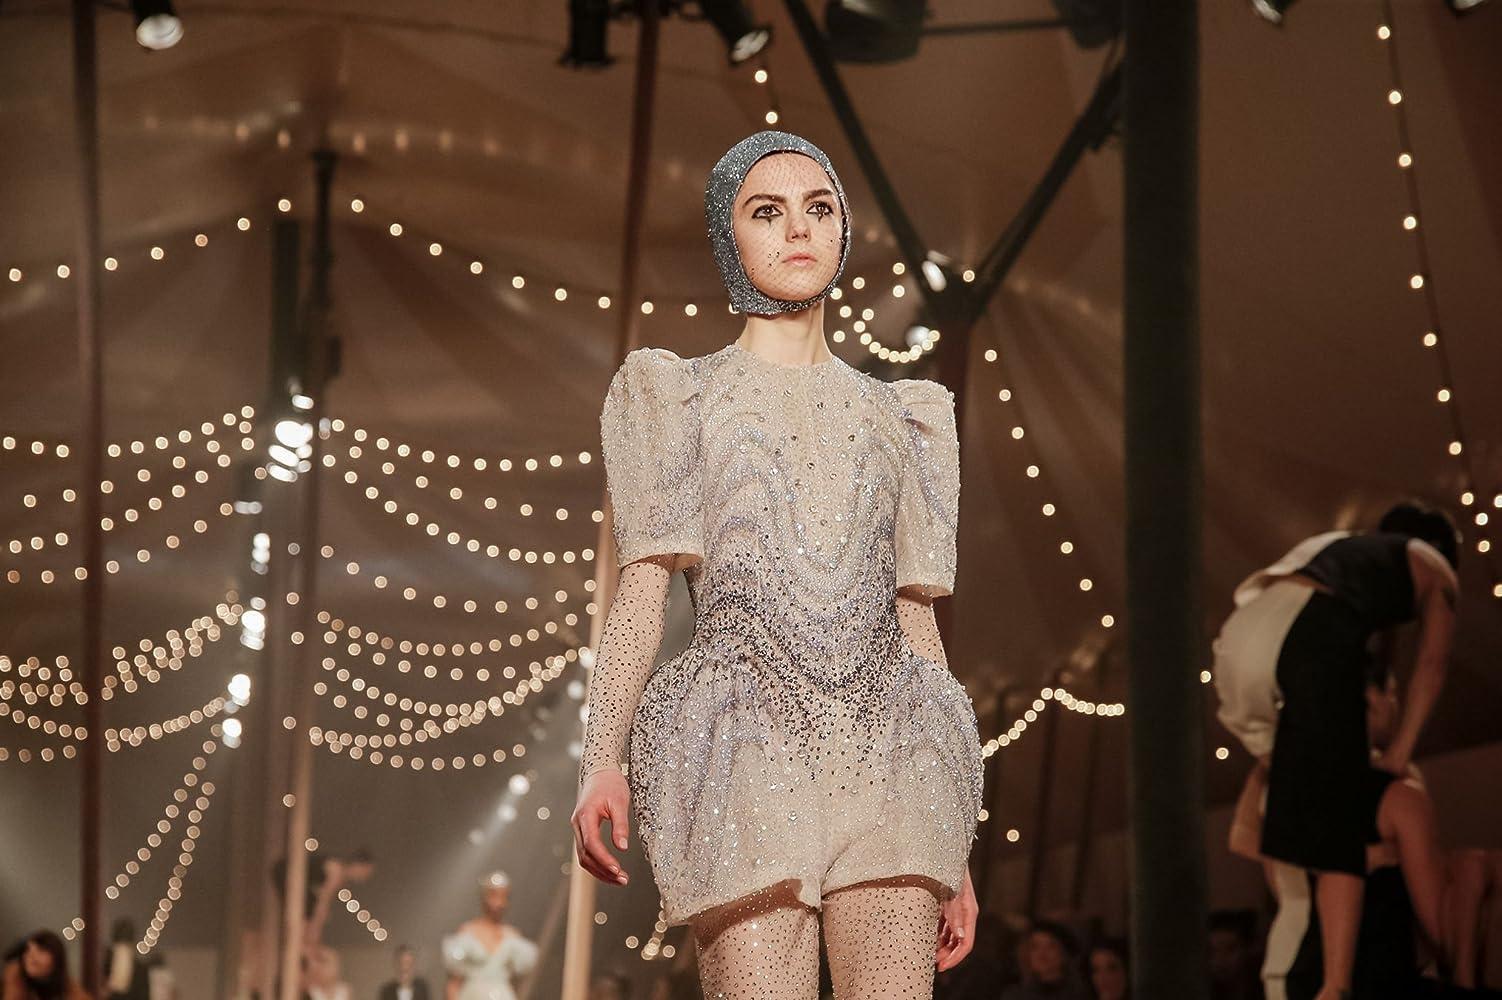 Christian Dior Haute Couture Spring Summer 2019 At Paris Fashion